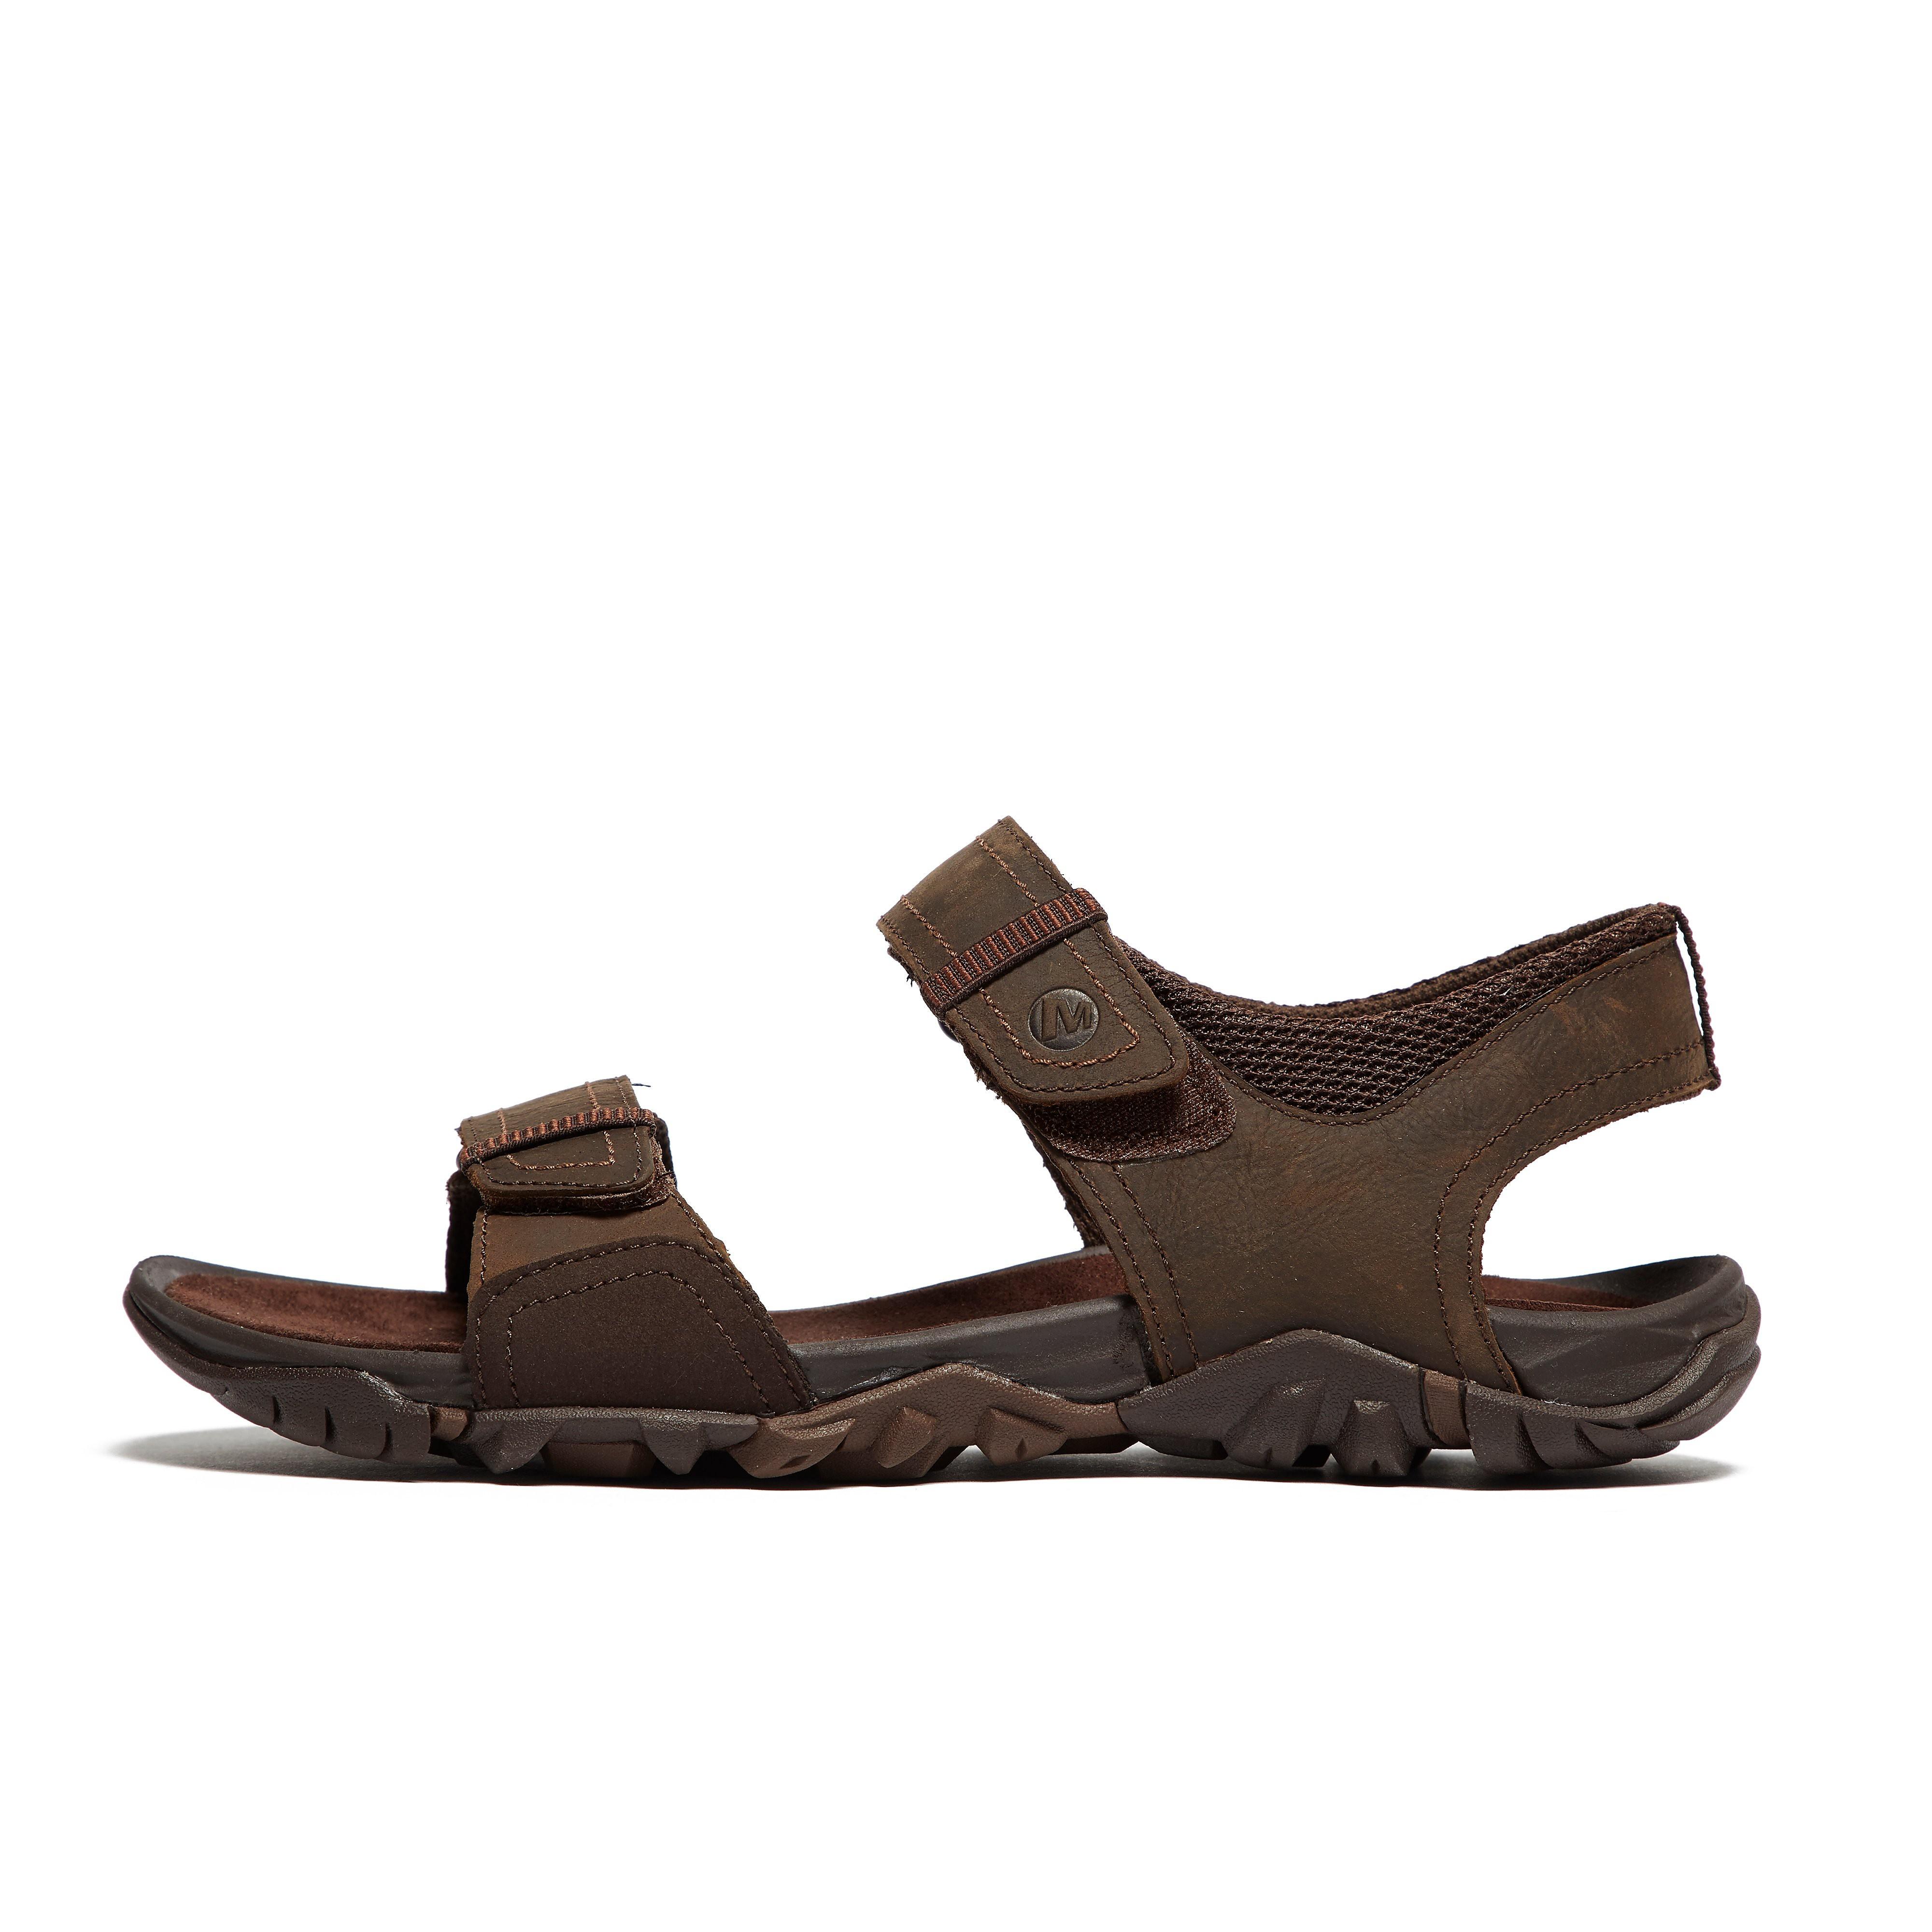 Merrell Telluride Strap Men's Walking Sandals